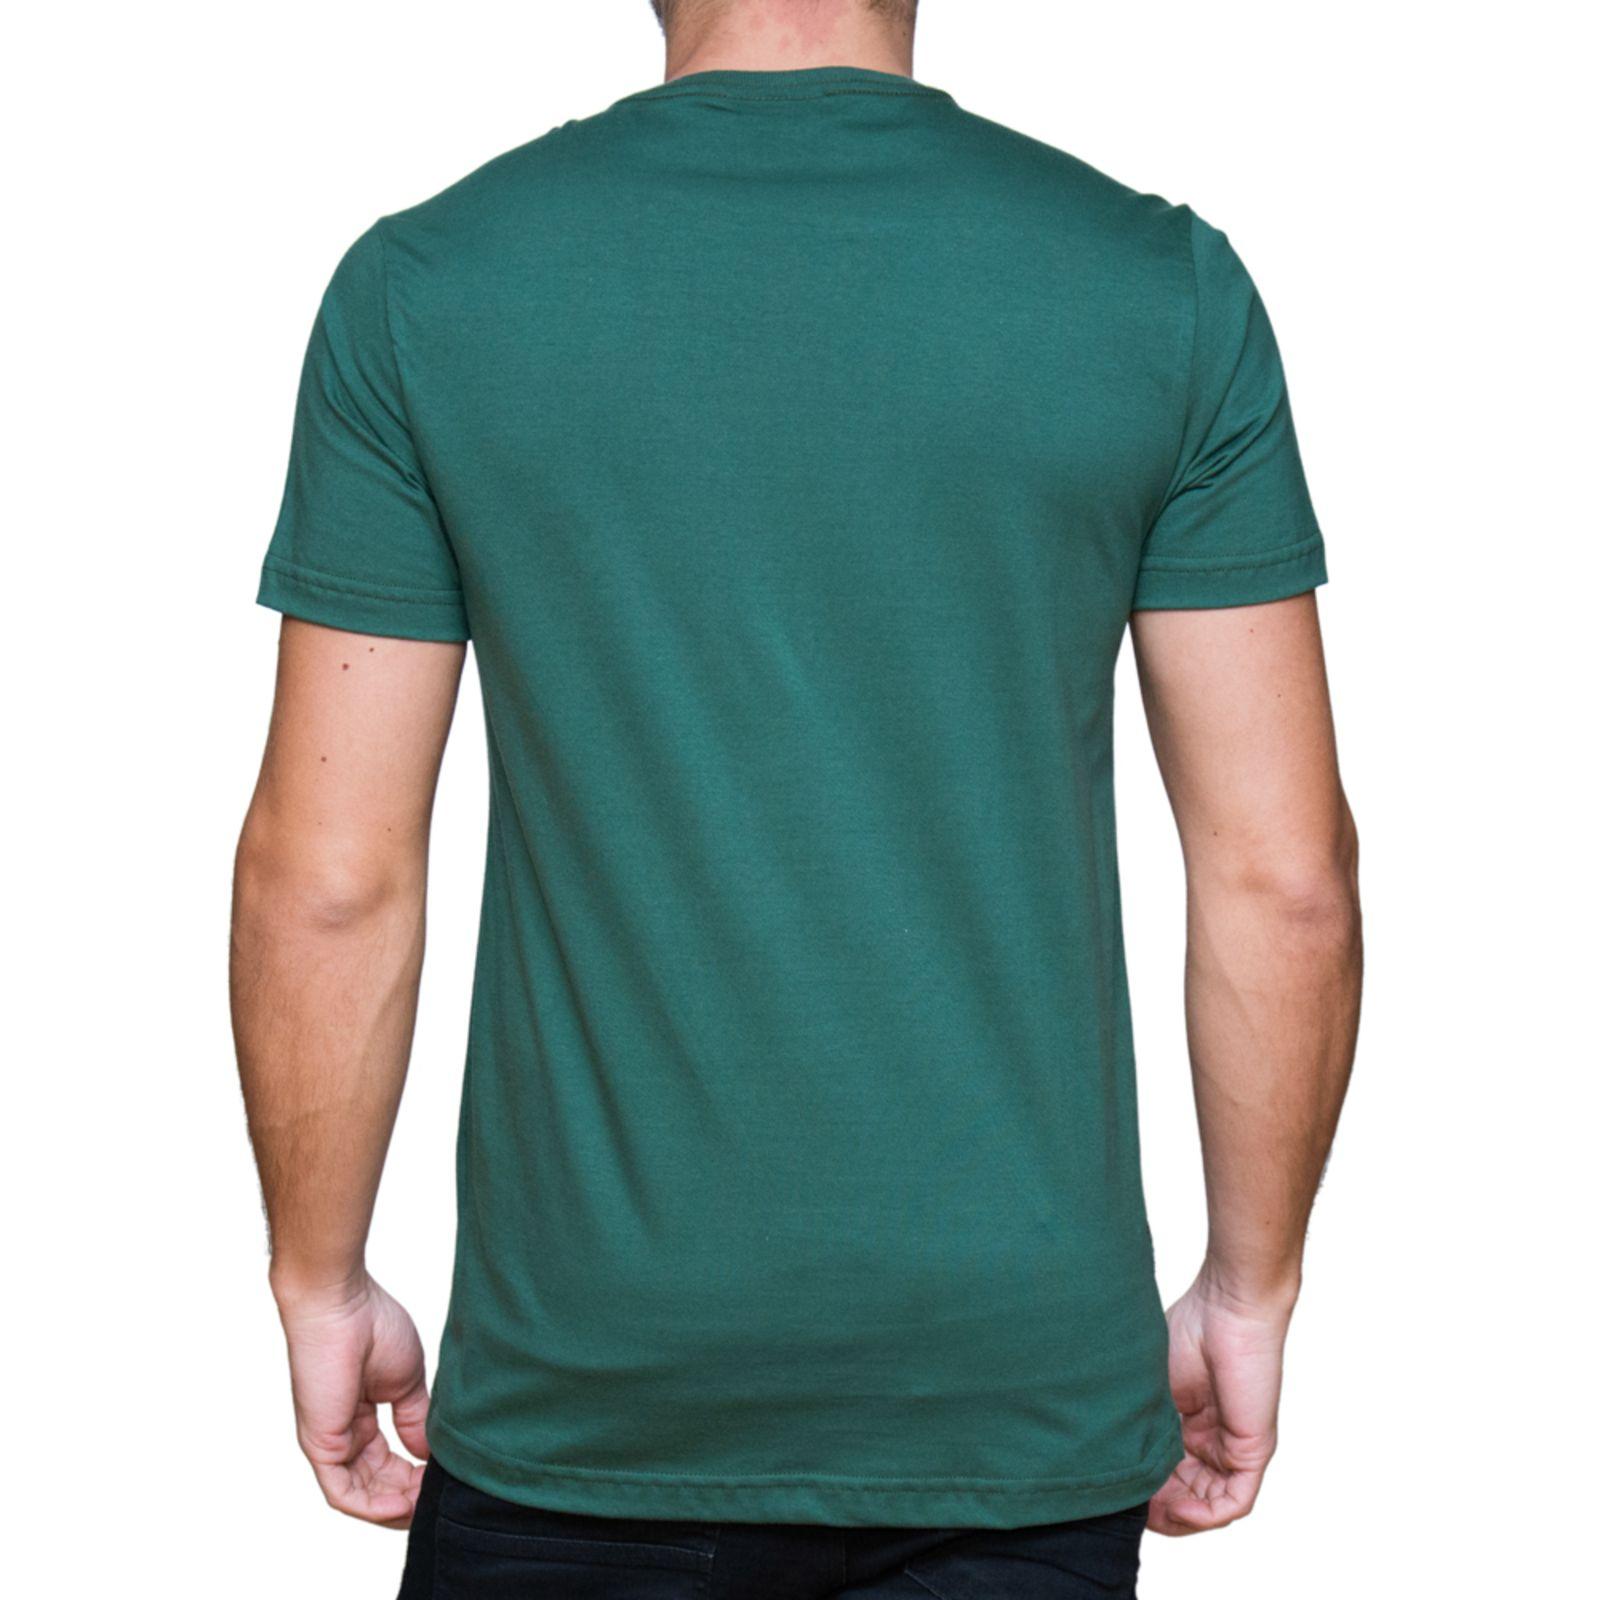 Camiseta Kevingston Login Verde Ingles de Algodao